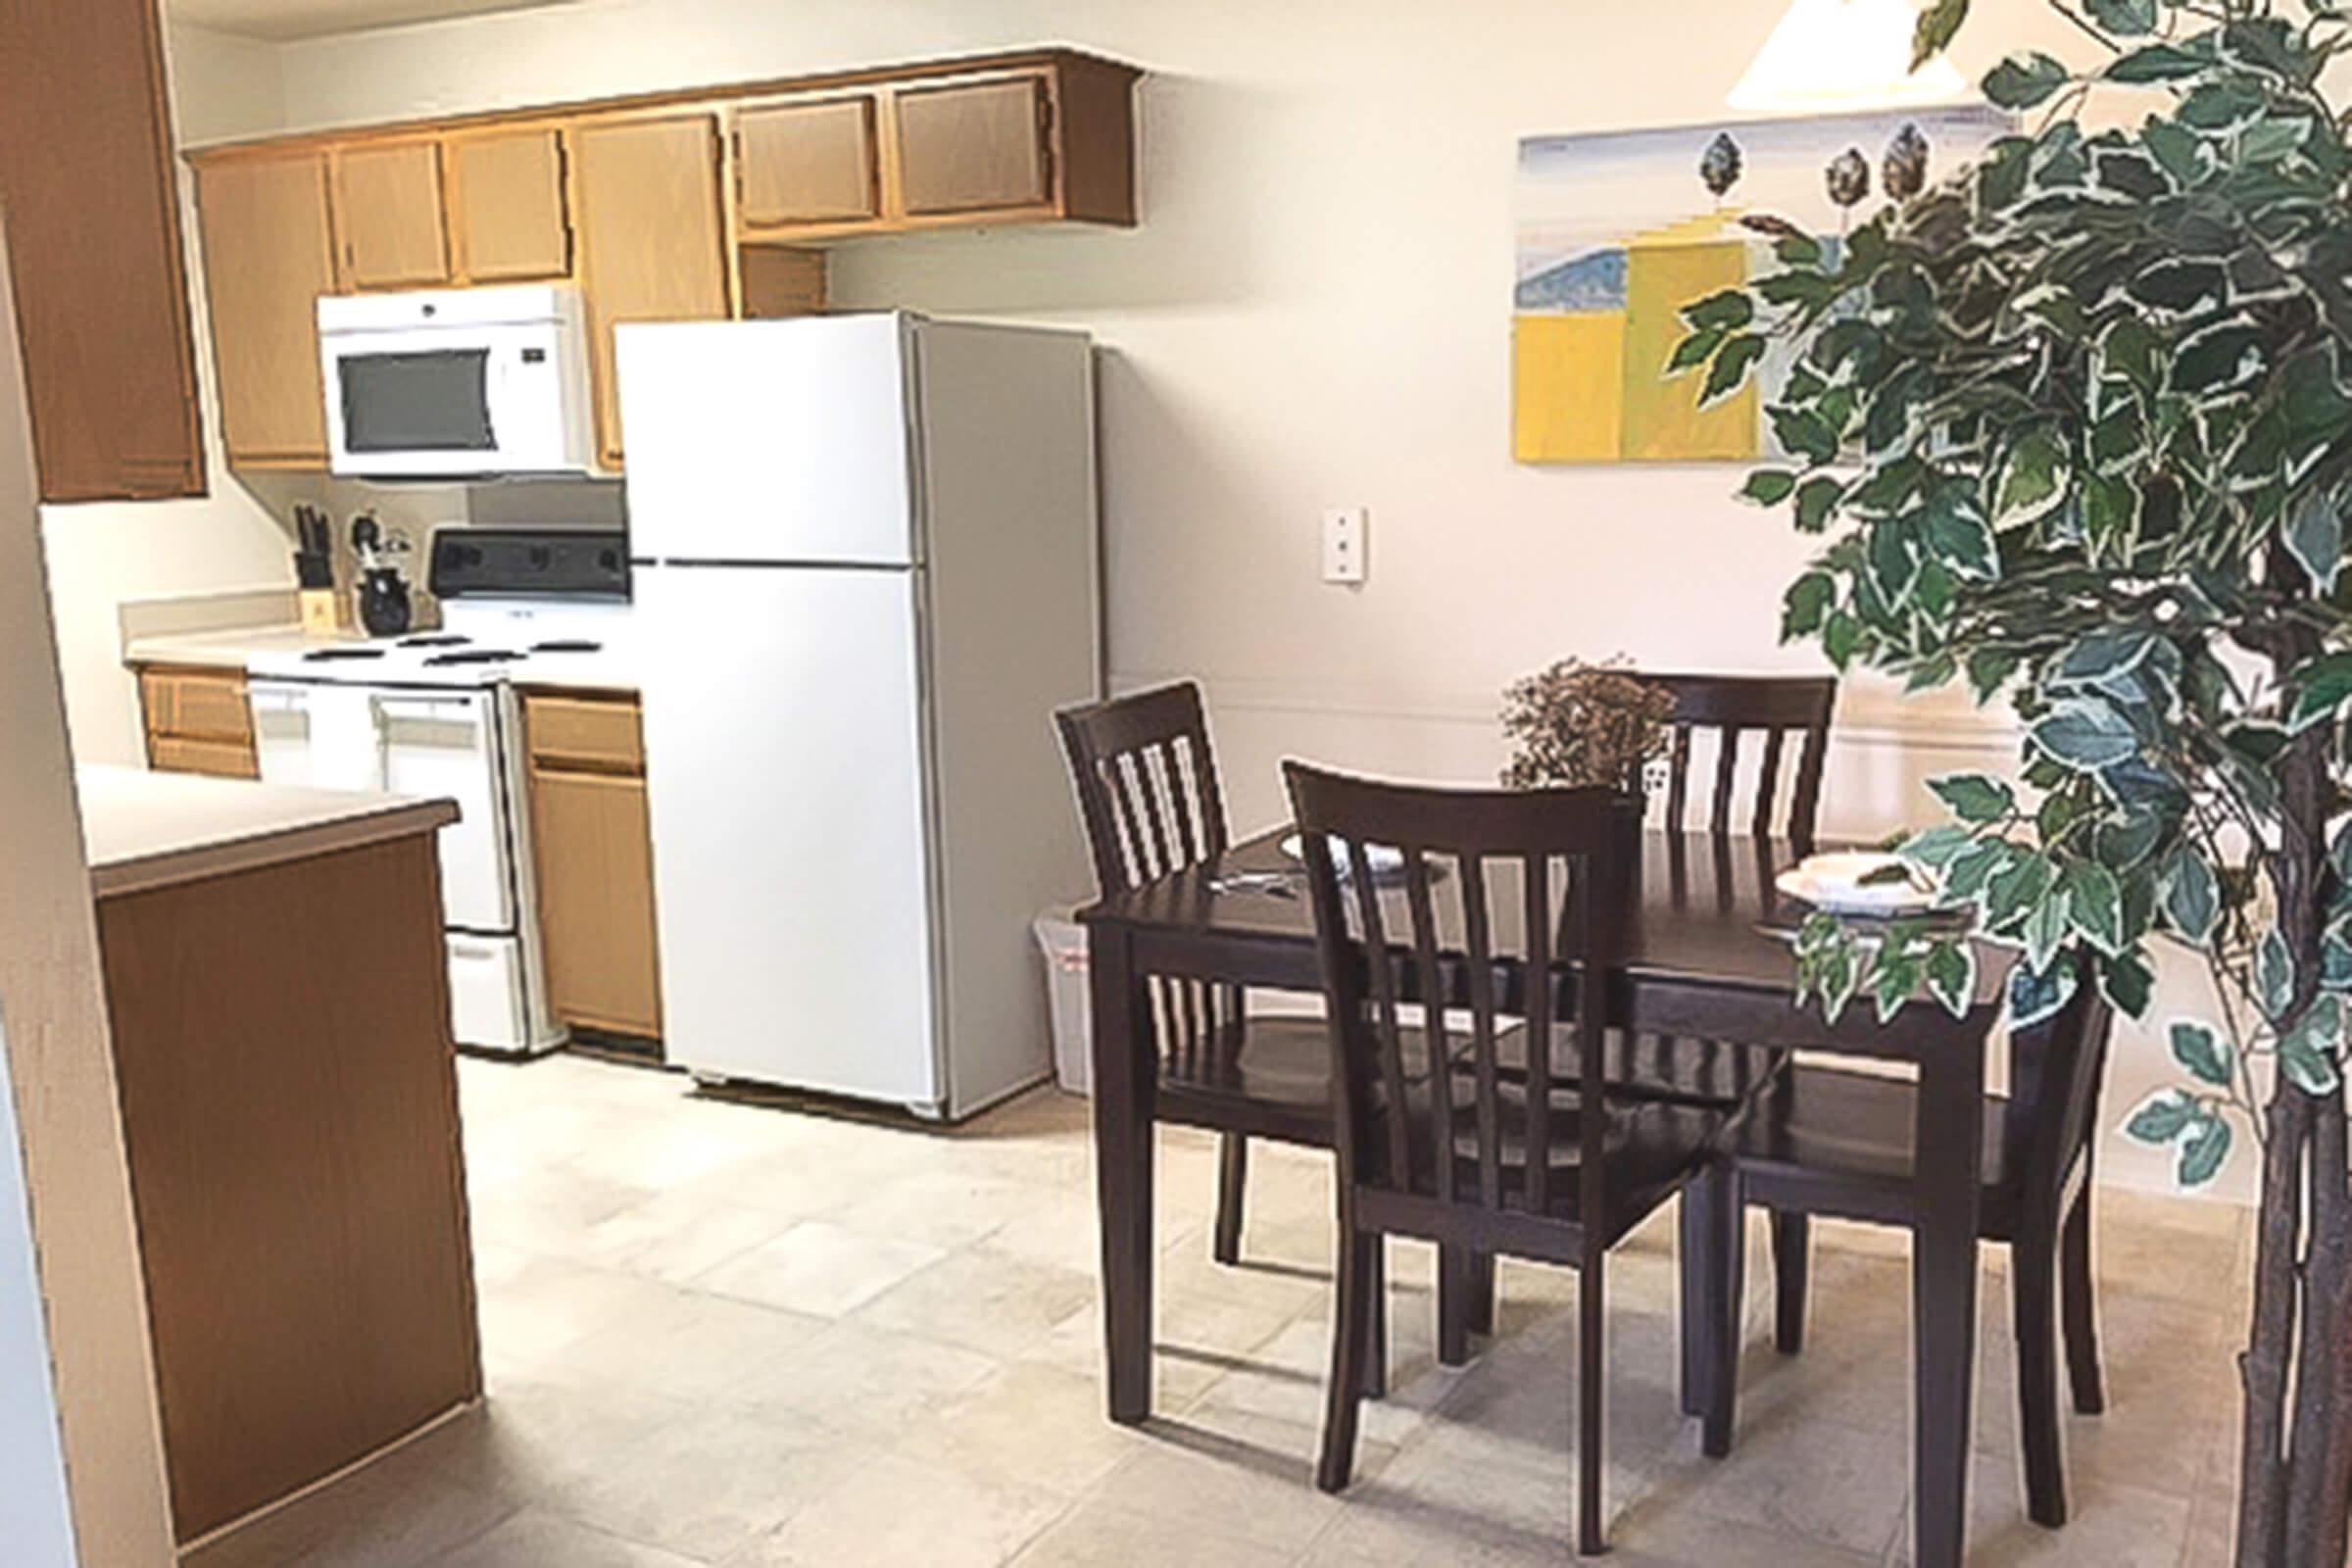 Apartments Near Flint Hills Technical College The Ridge of Emporia for Flint Hills Technical College Students in Emporia, KS